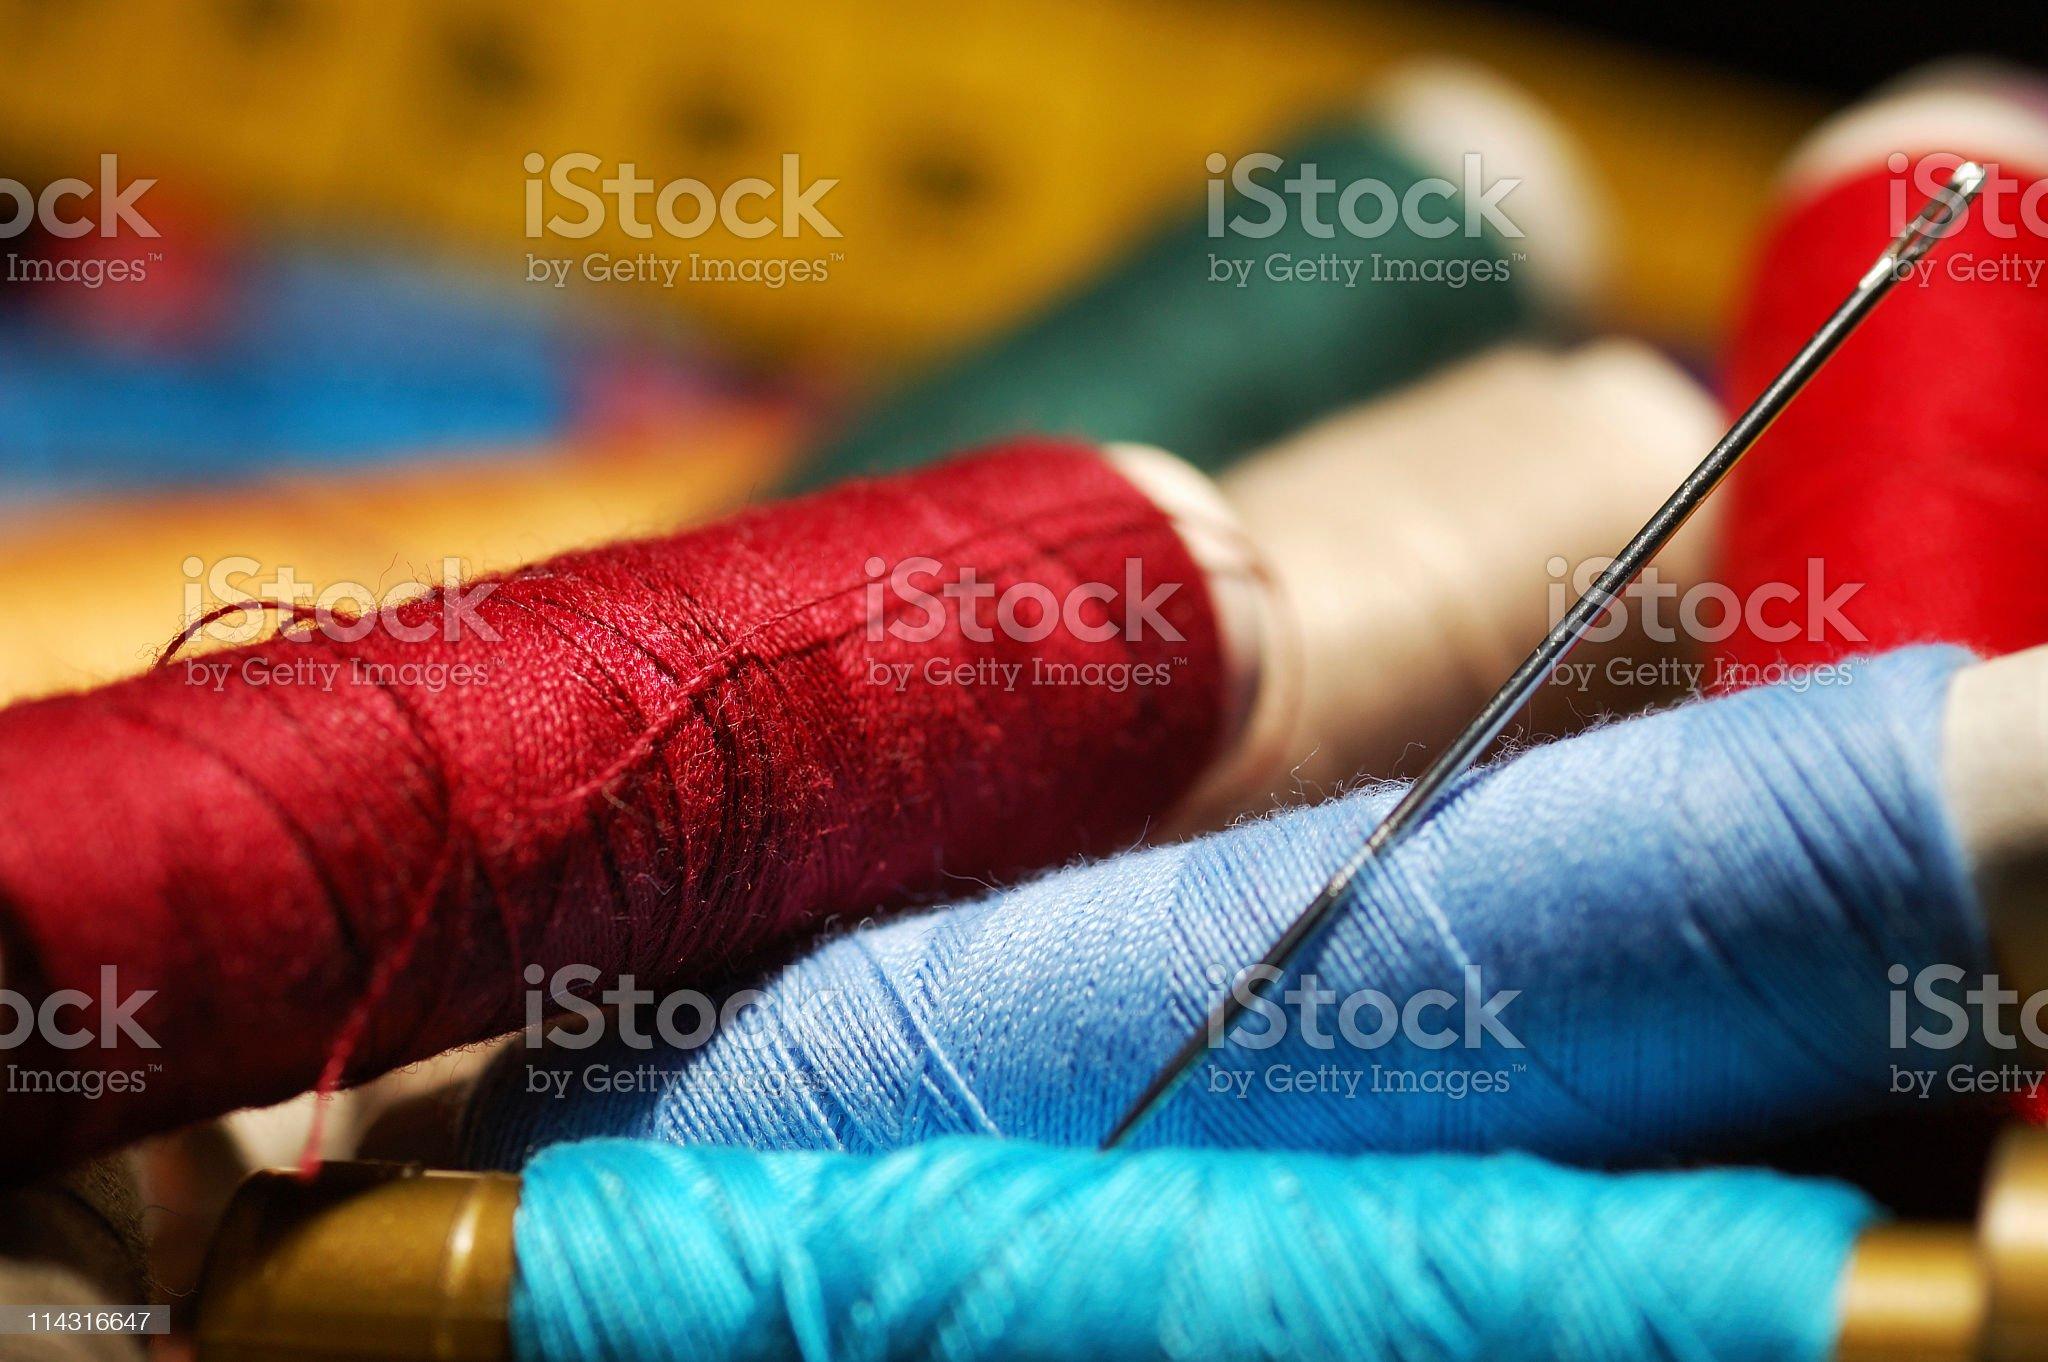 Sewing Materials royalty-free stock photo